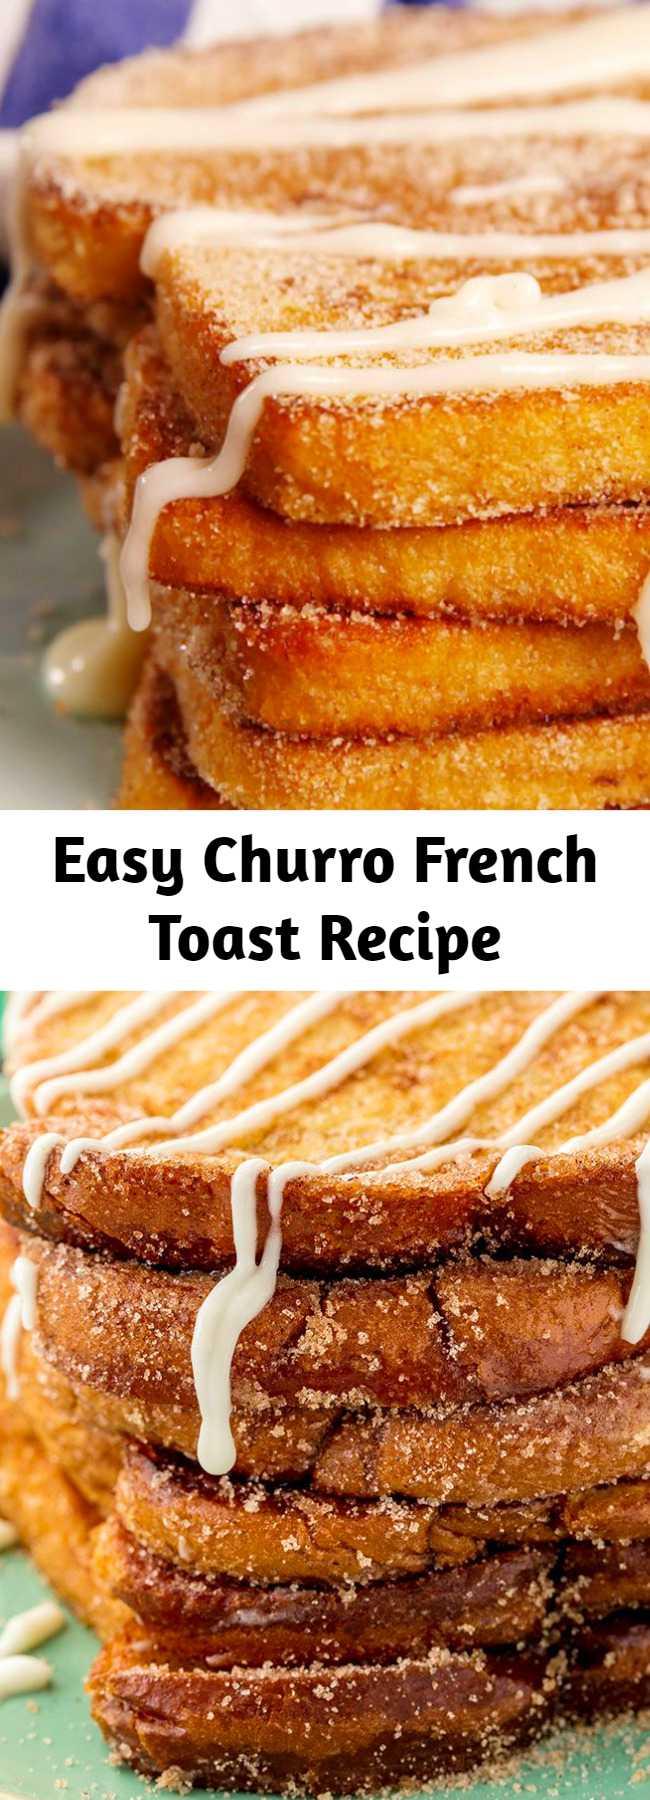 Churro-fy your breakfast! 😏 #easy #recipe #churro #frenchtoast #breakfast #cinnamon #sugar #brunch